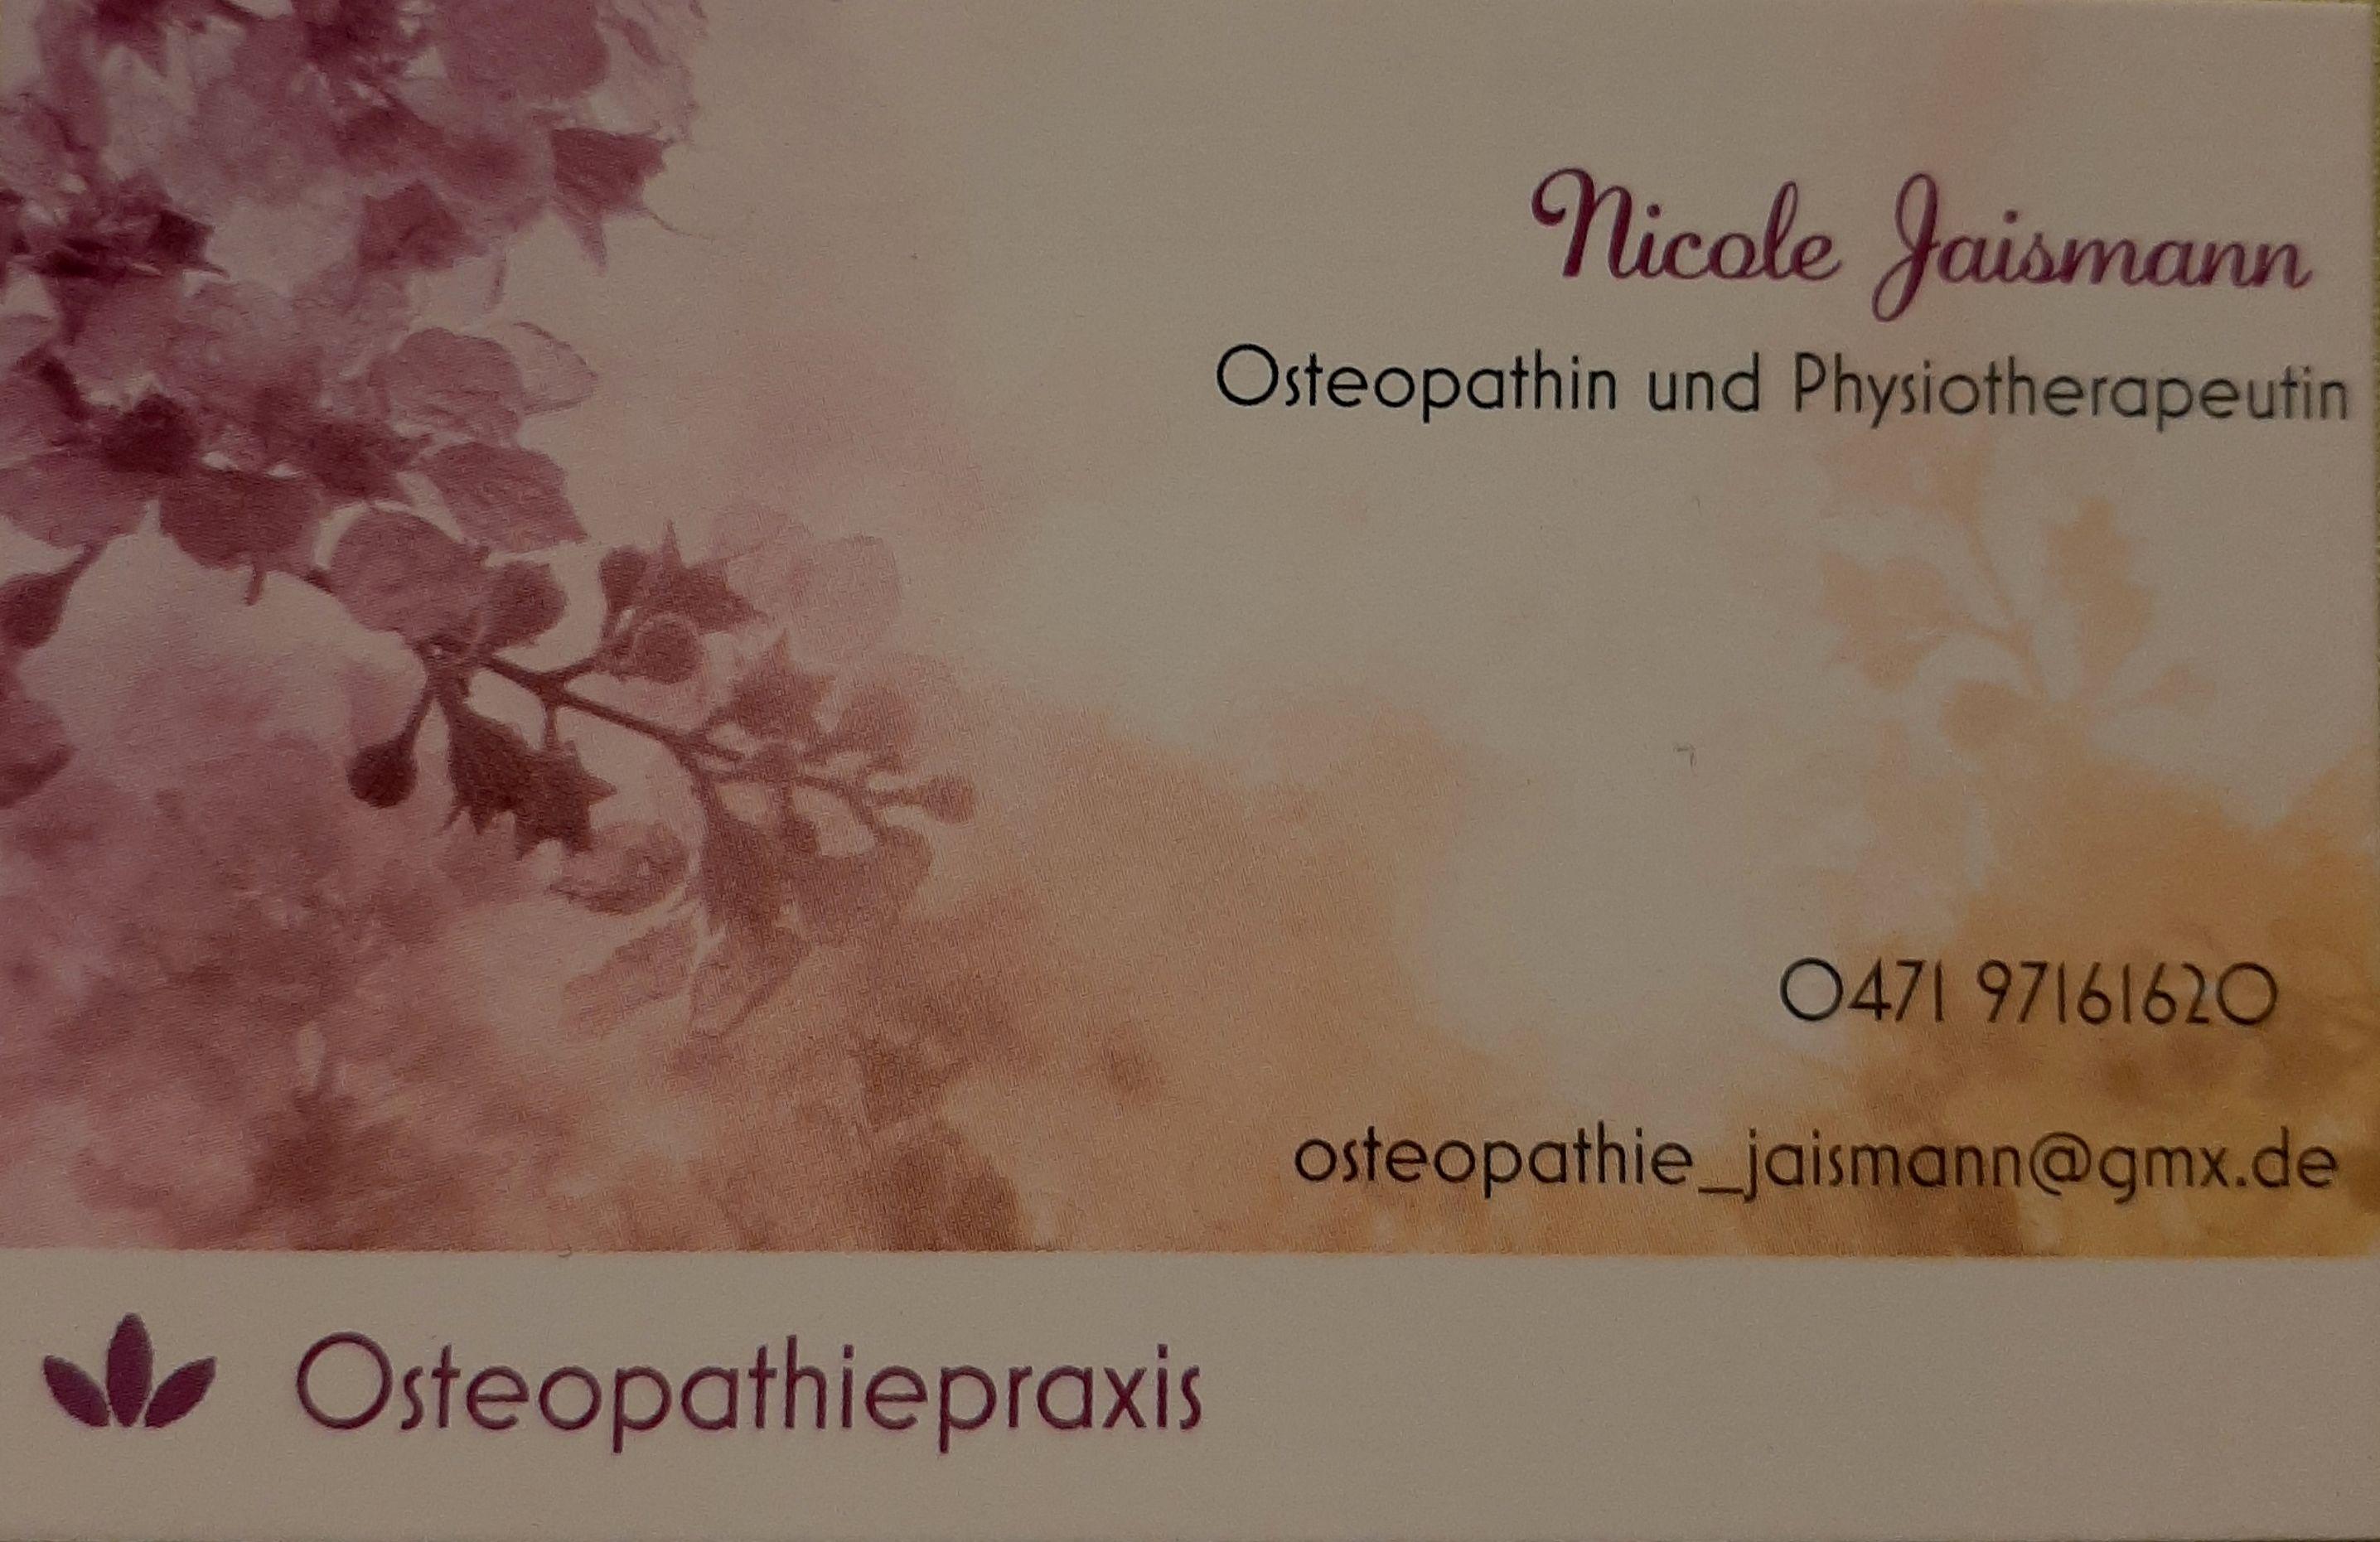 Osteopathiepraxis Nicole Jaismann